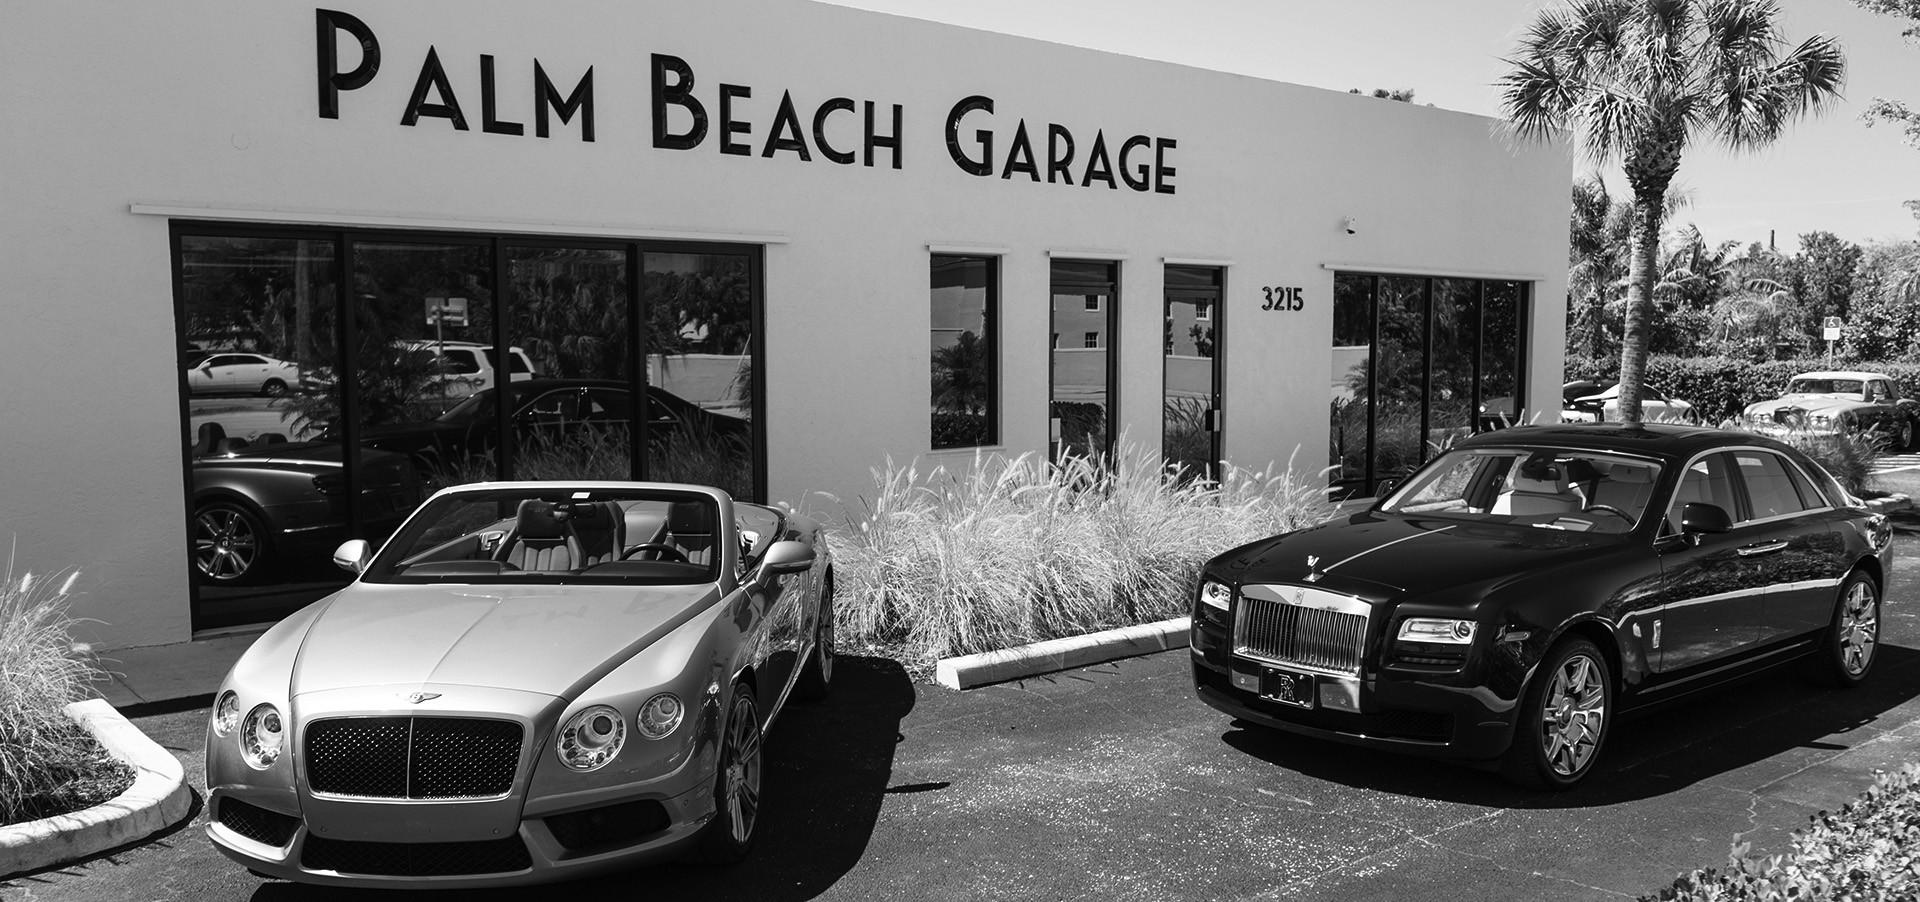 Palm Beach Garage West Palm Beach